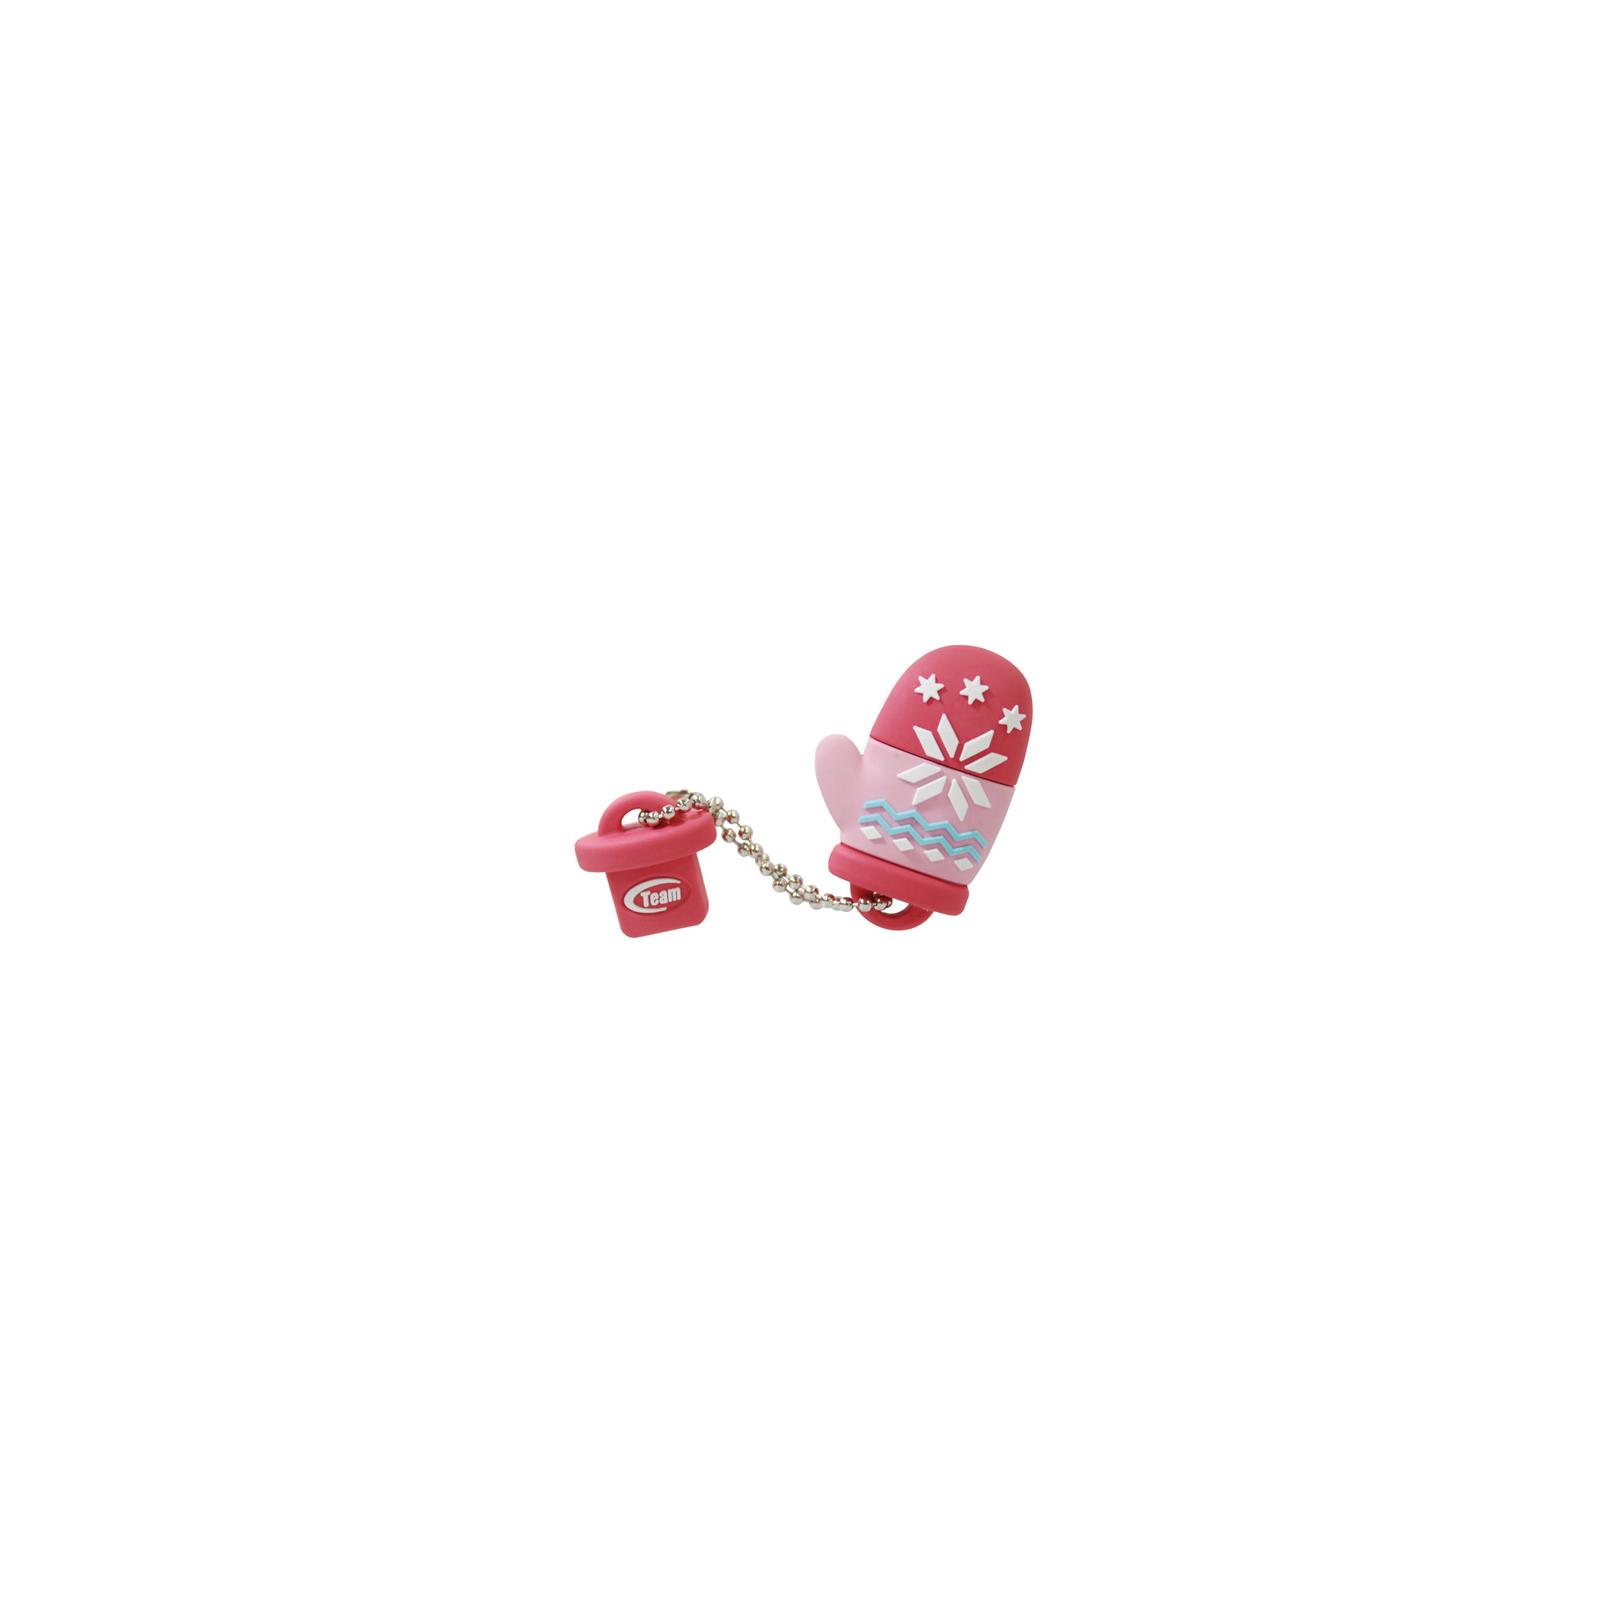 USB флеш накопитель Team 16Gb T134 pink (TT13416GK01)